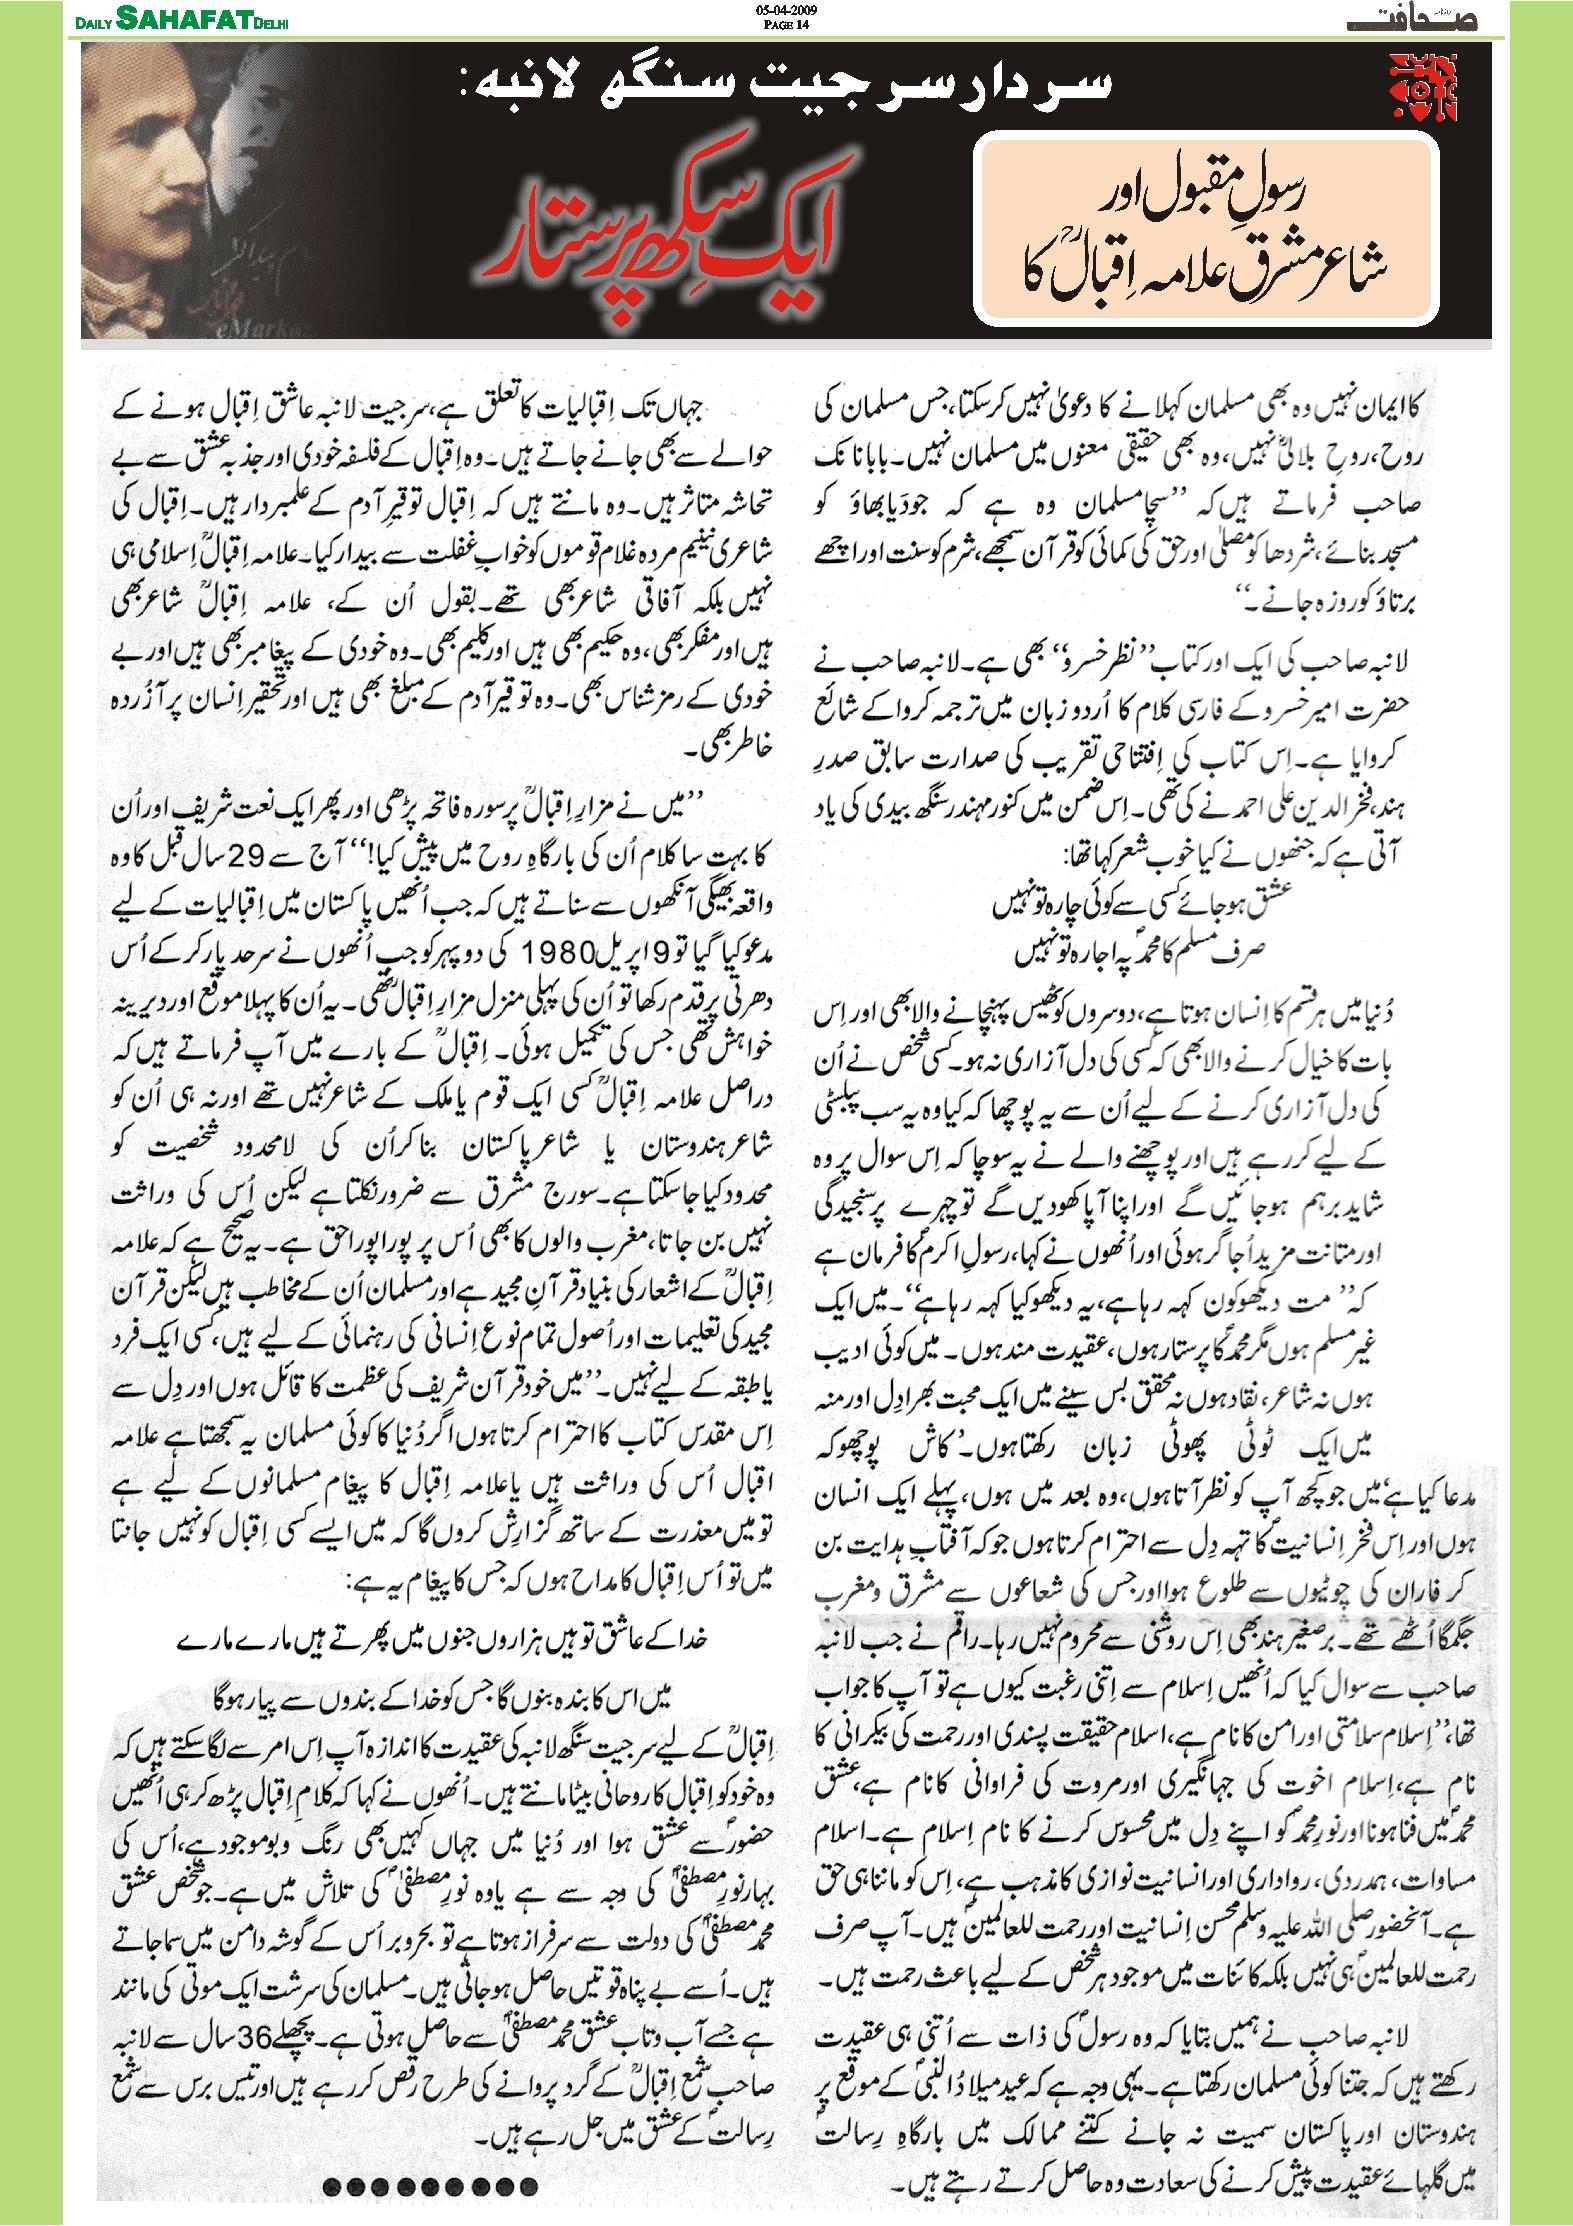 Bibi pak daman history urdu